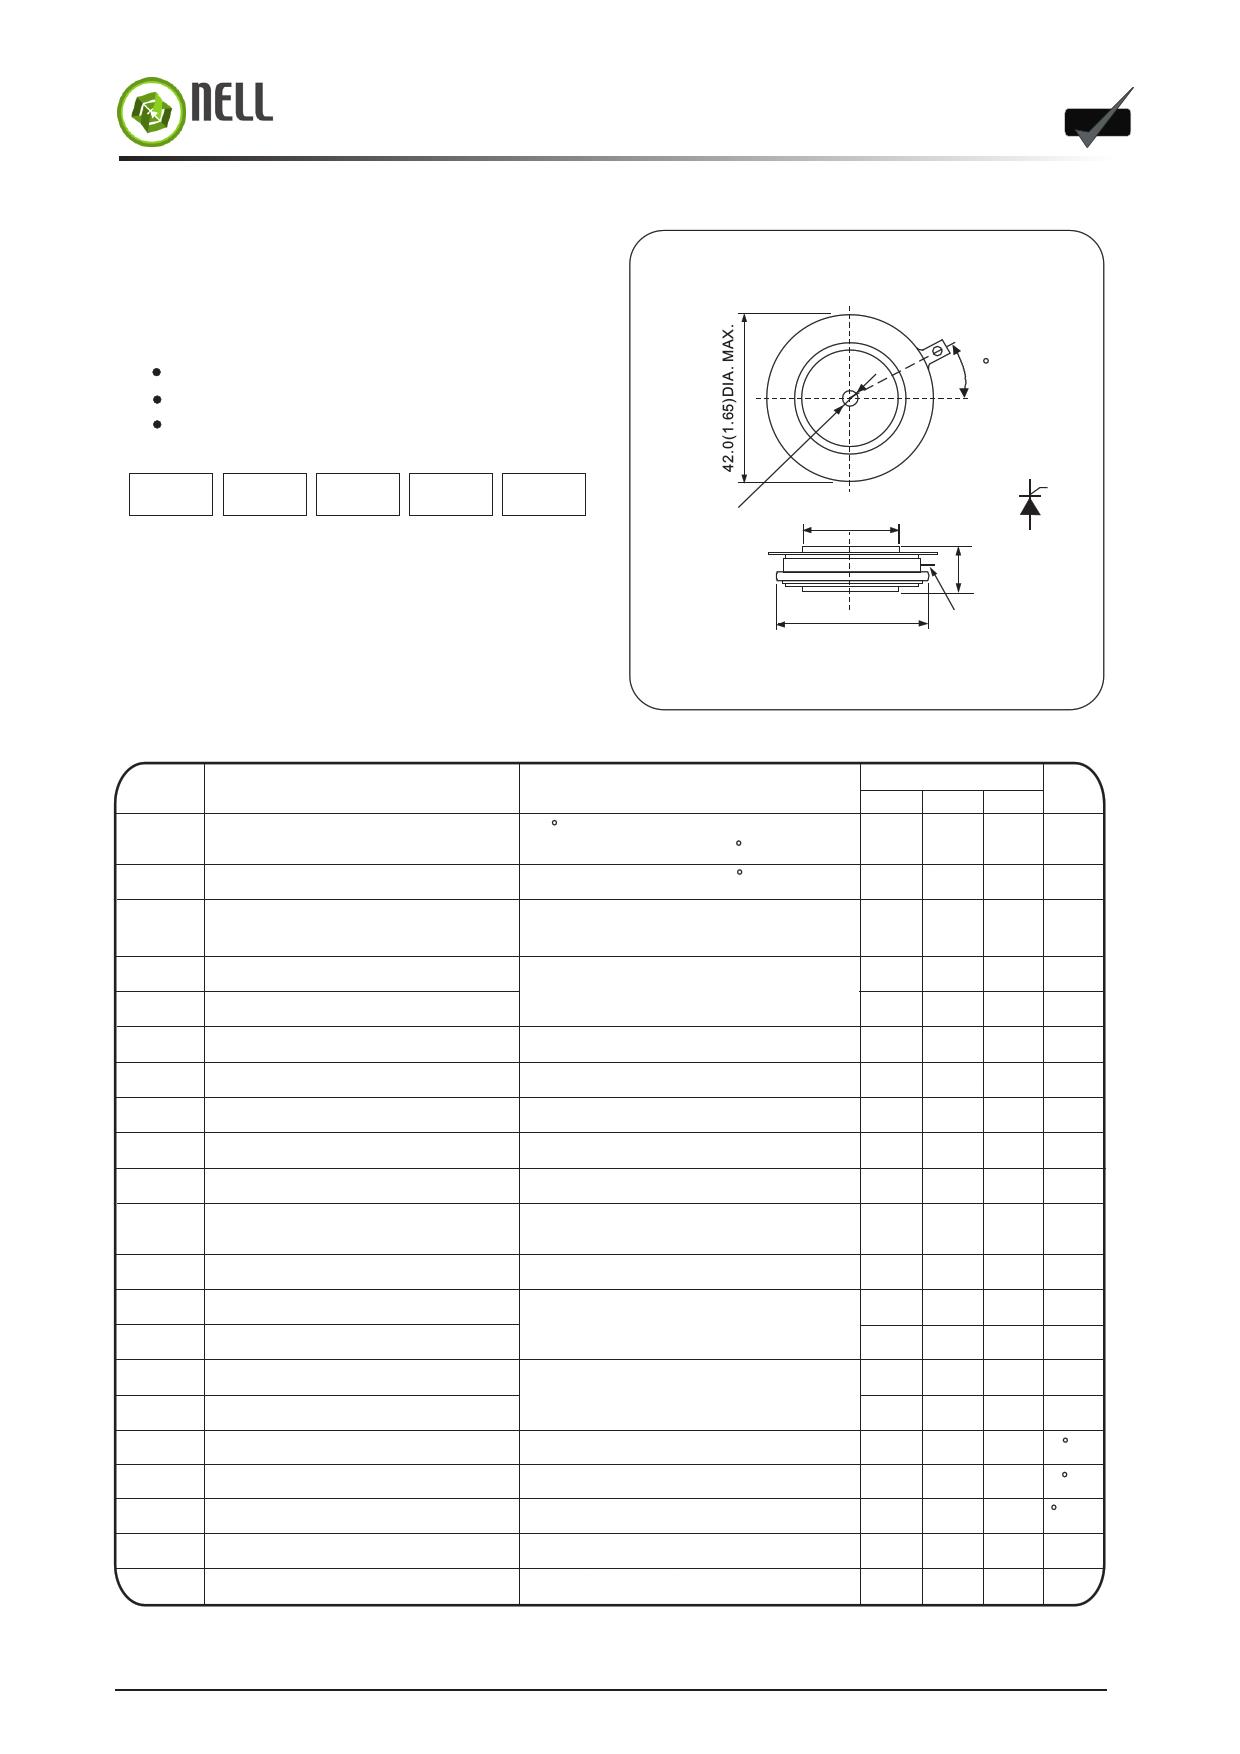 400PT datasheet